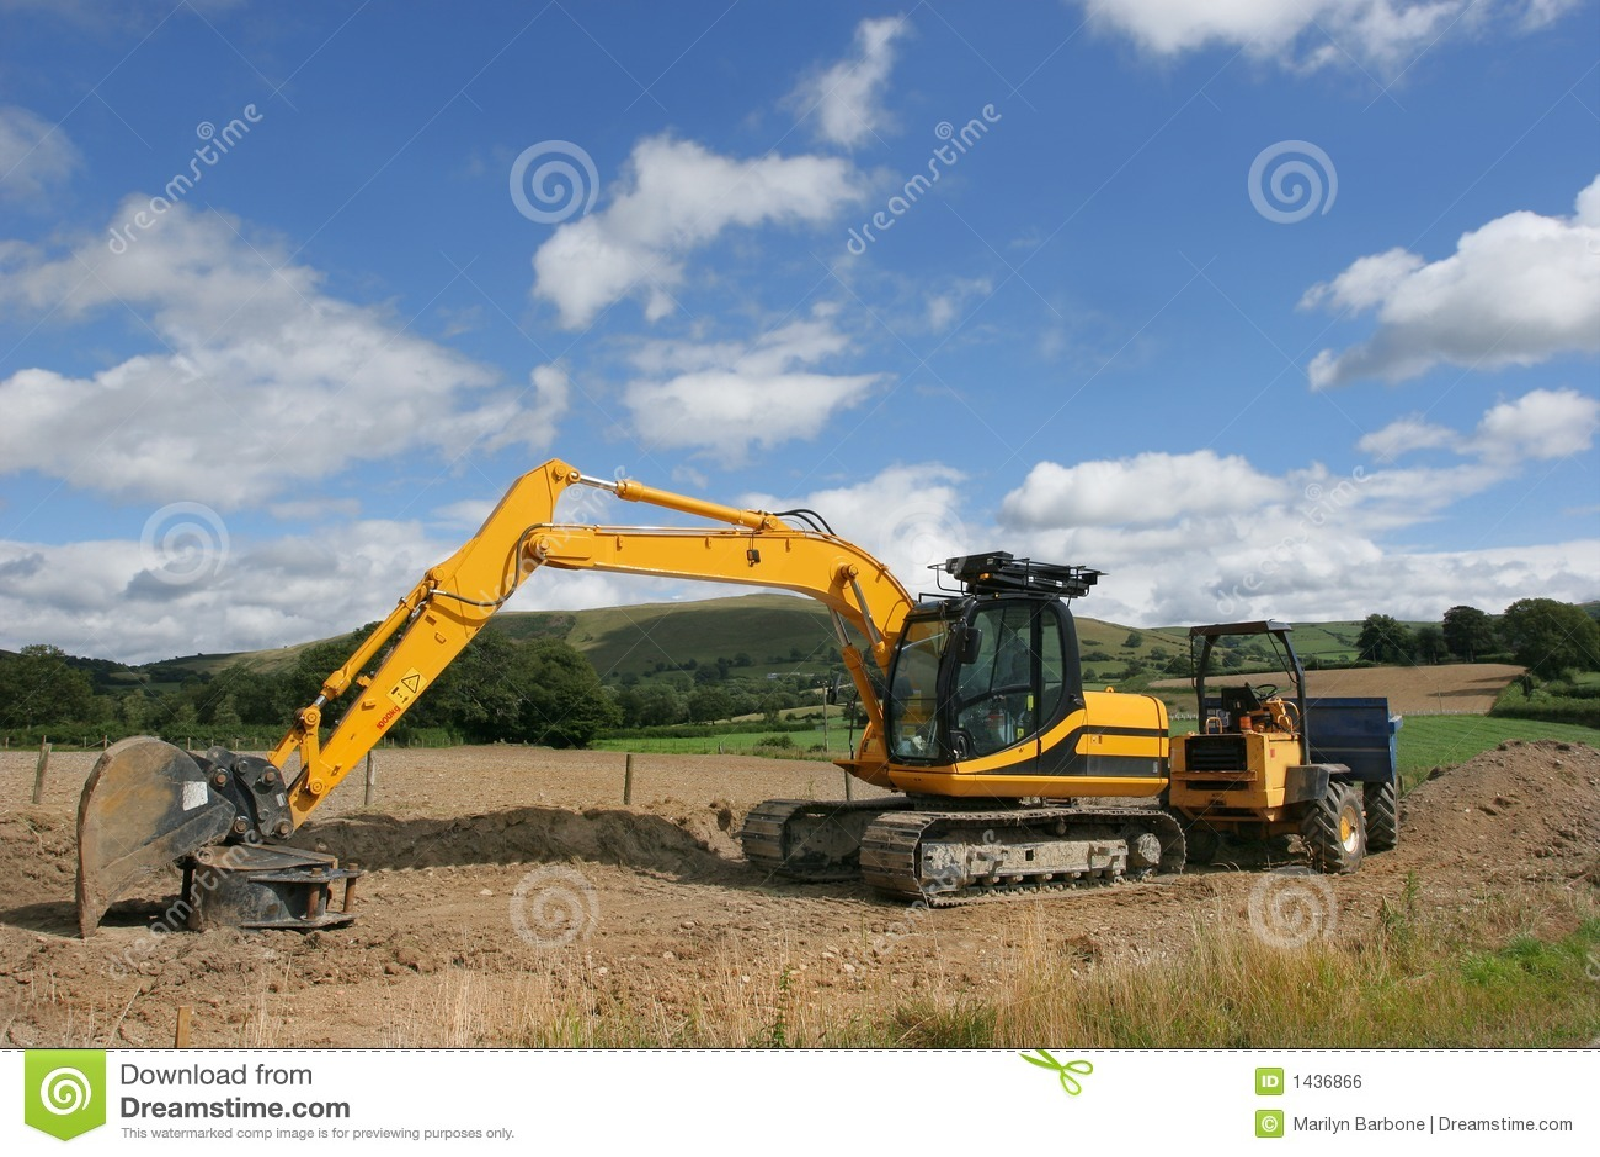 Gold Digger FRVR - Deep Mining - Dig and Match Exploration